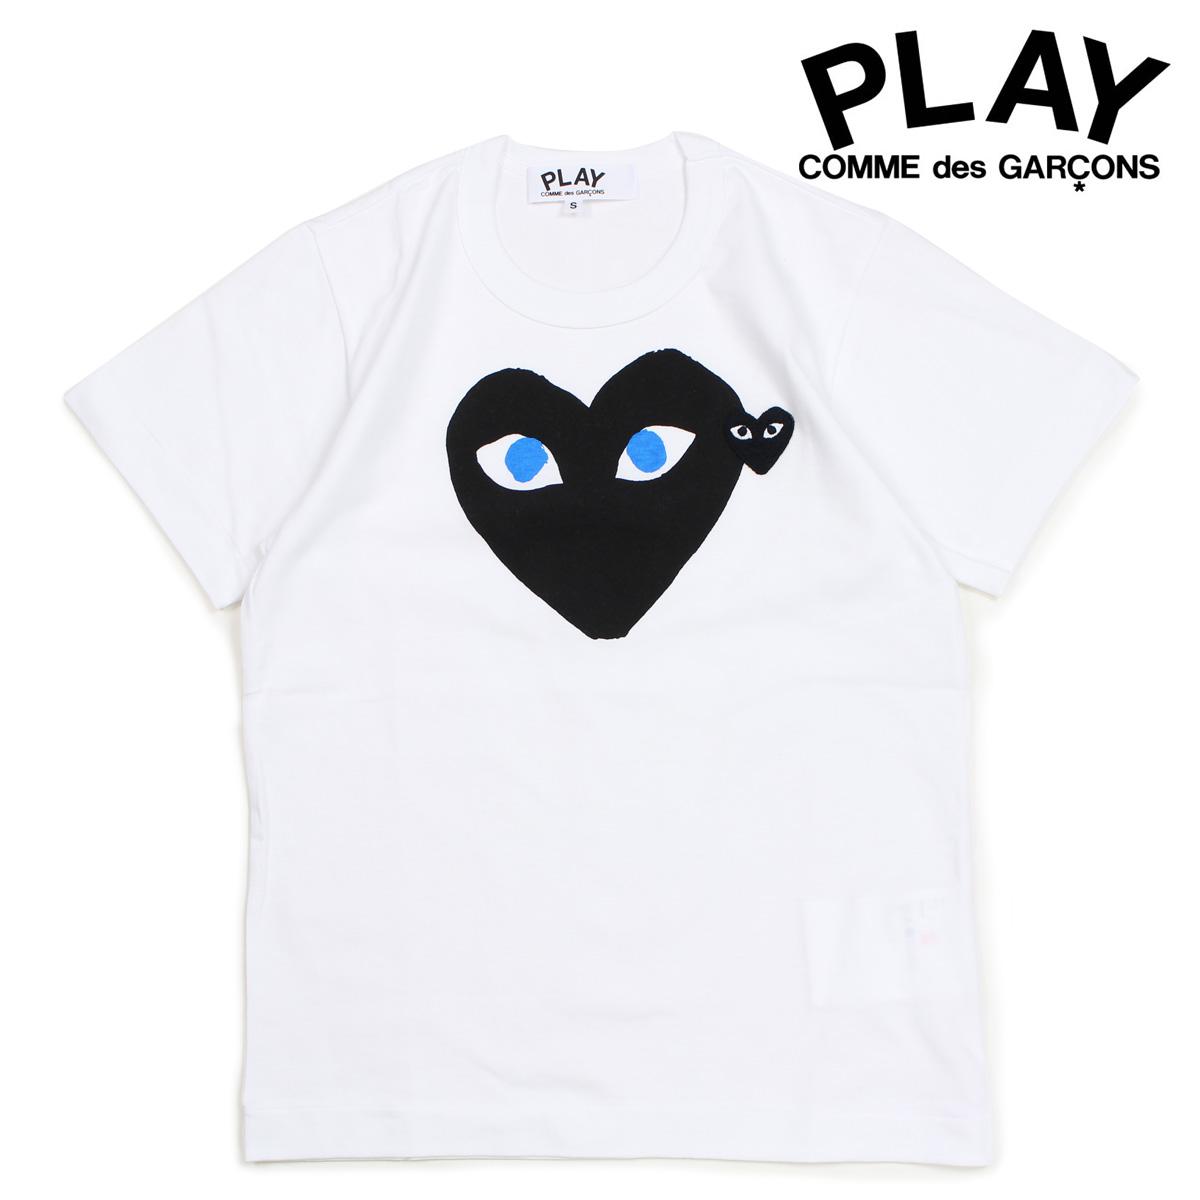 COMME des GARCONS PLAY Tシャツ 半袖 コムデギャルソン レディース BLACK HEART T-SHIRT ホワイト AZT087 [10/3 新入荷]